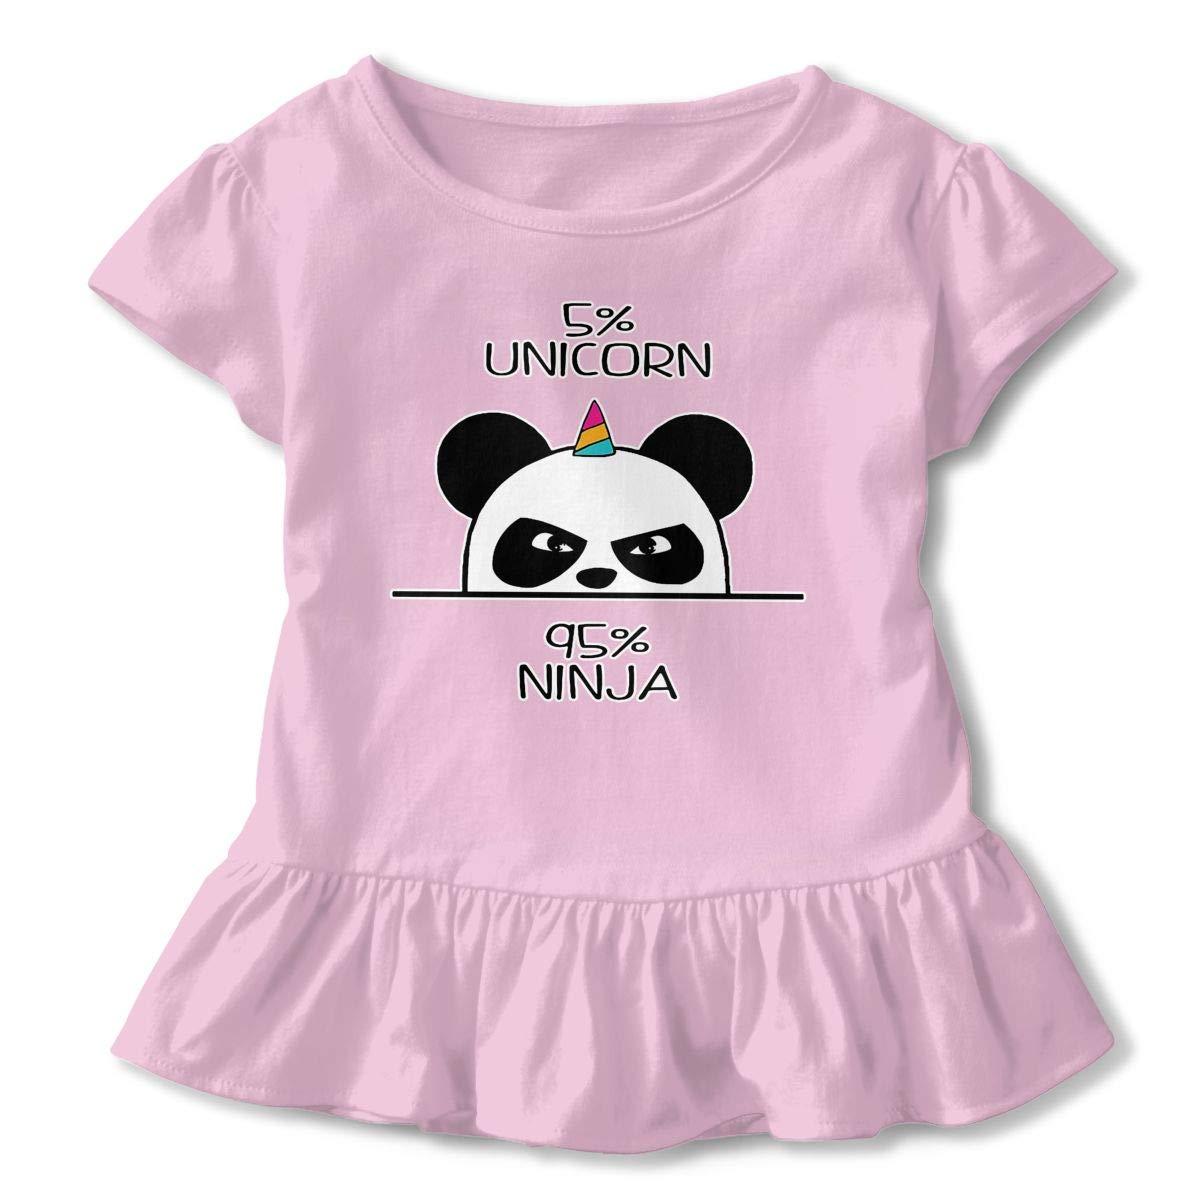 Unicorn Ninja Panda Toddler Baby Girl Ruffle Short Sleeve T-Shirt Comfortable Cotton T Shirts